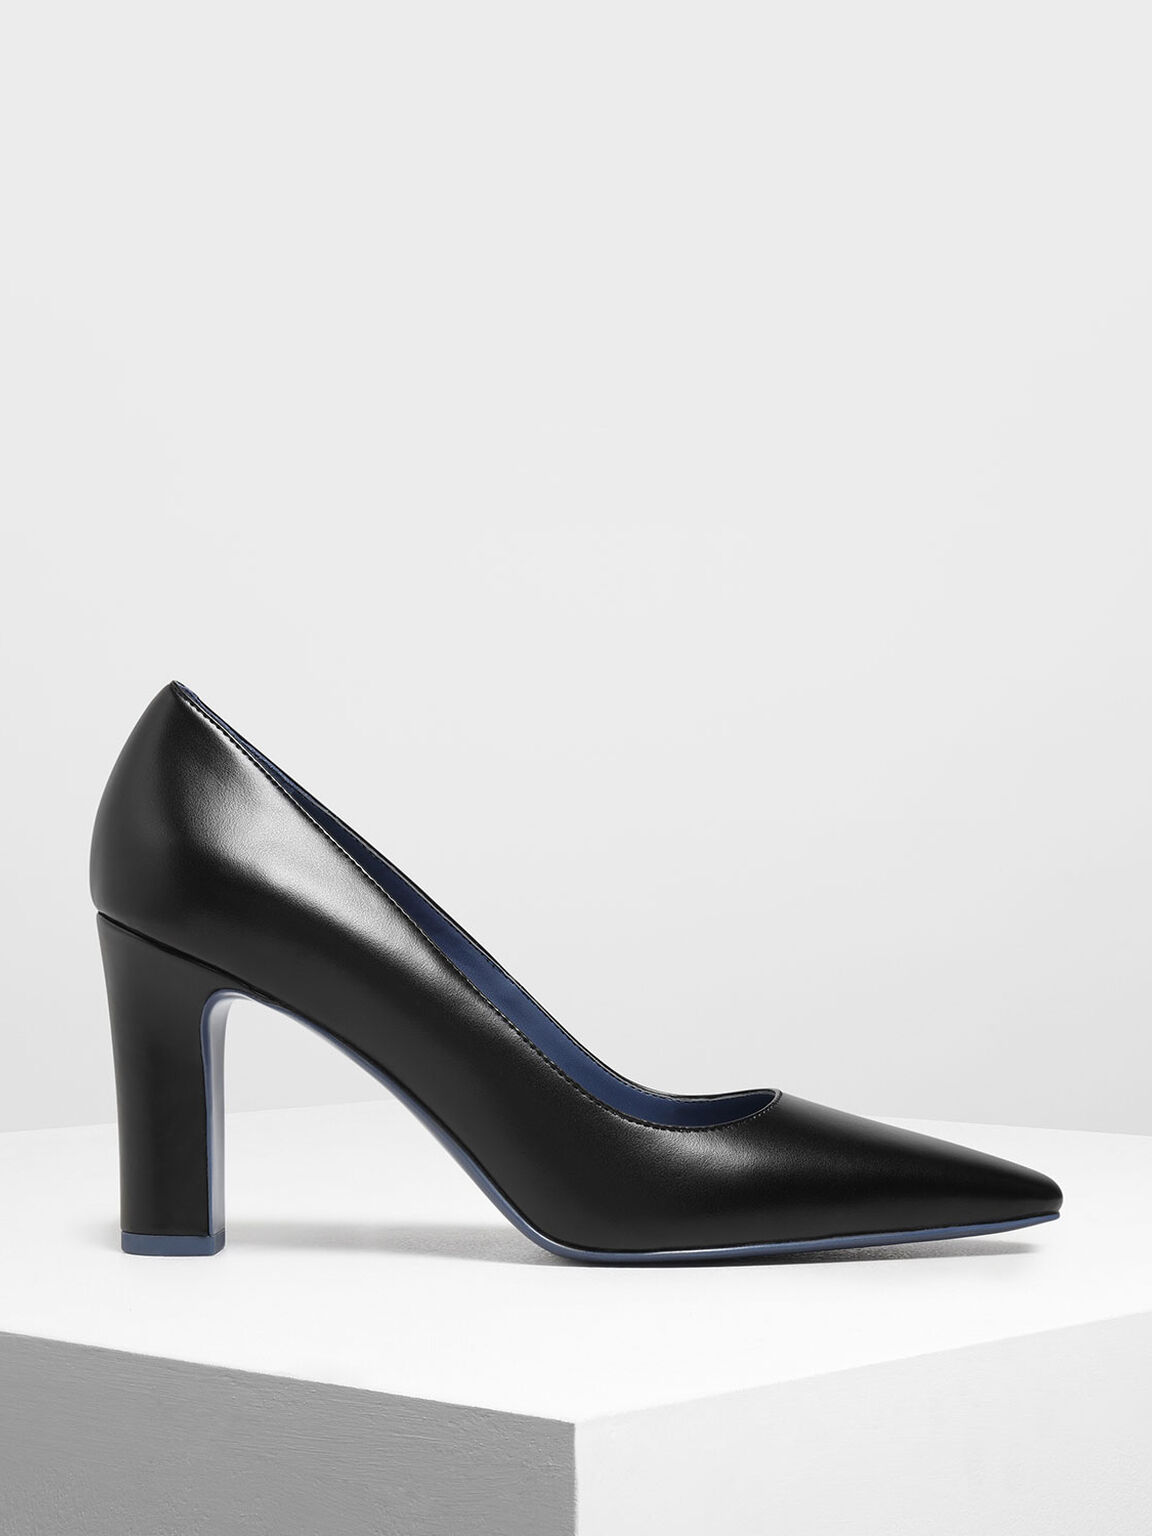 Pointed Toe Chunky Heel Pumps, Black, hi-res